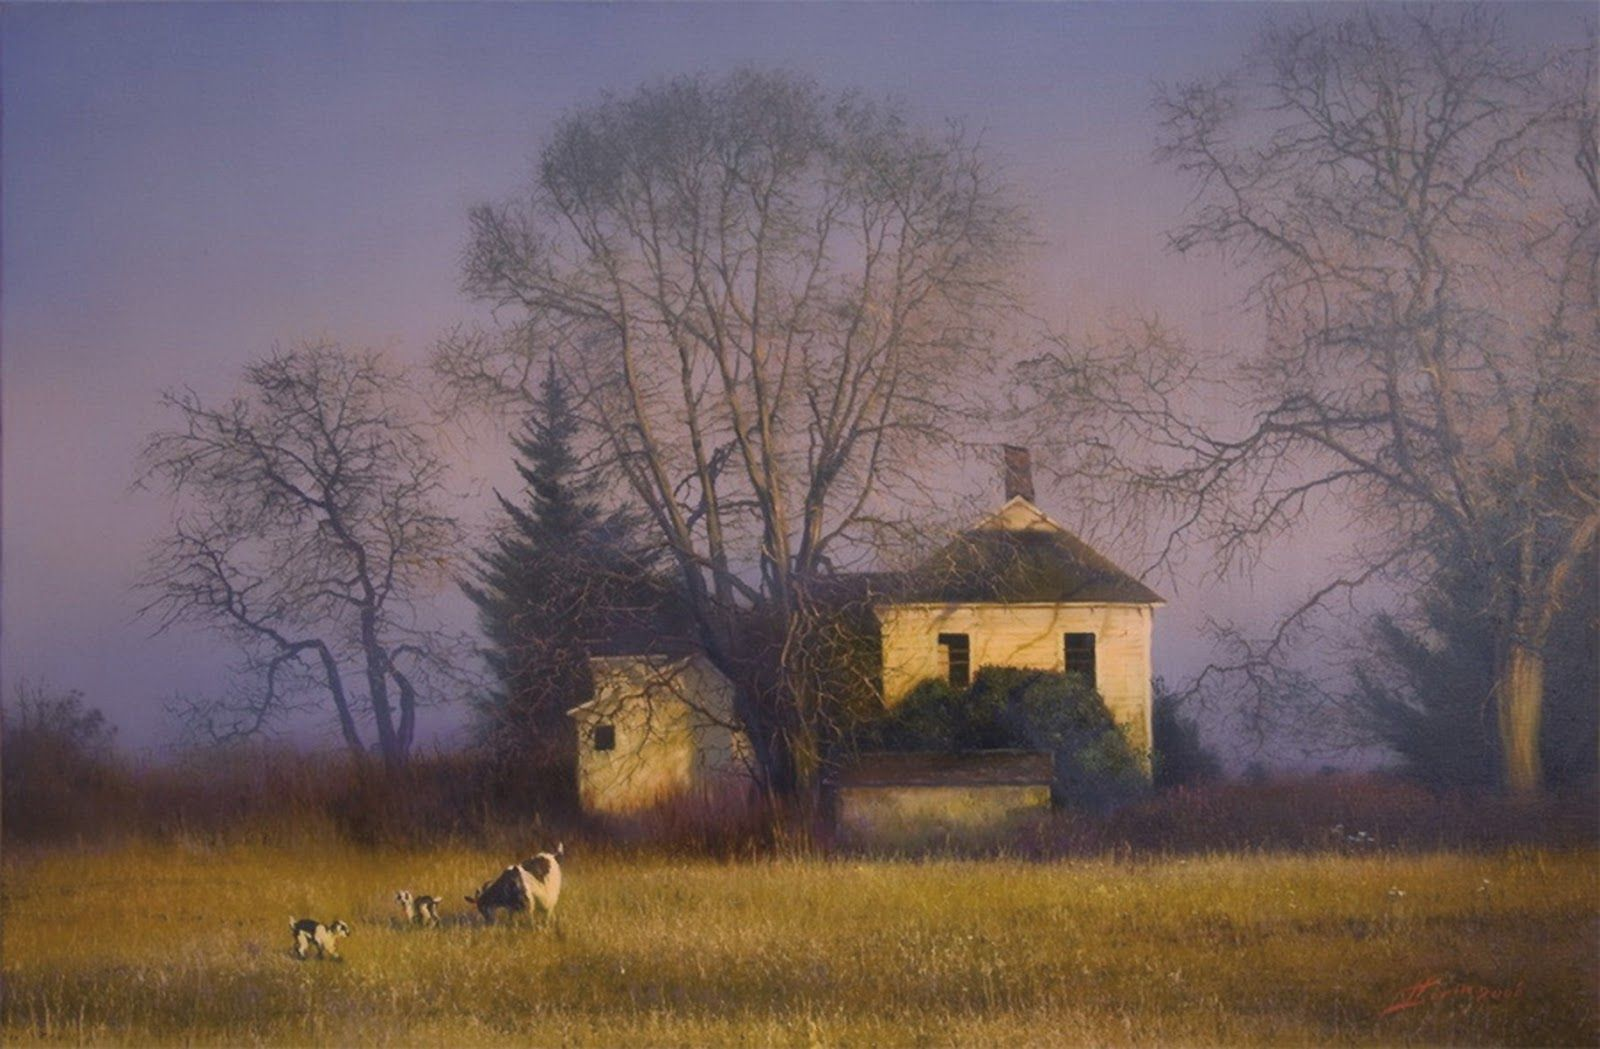 Vladimir Sorin | O Mundo da Arte